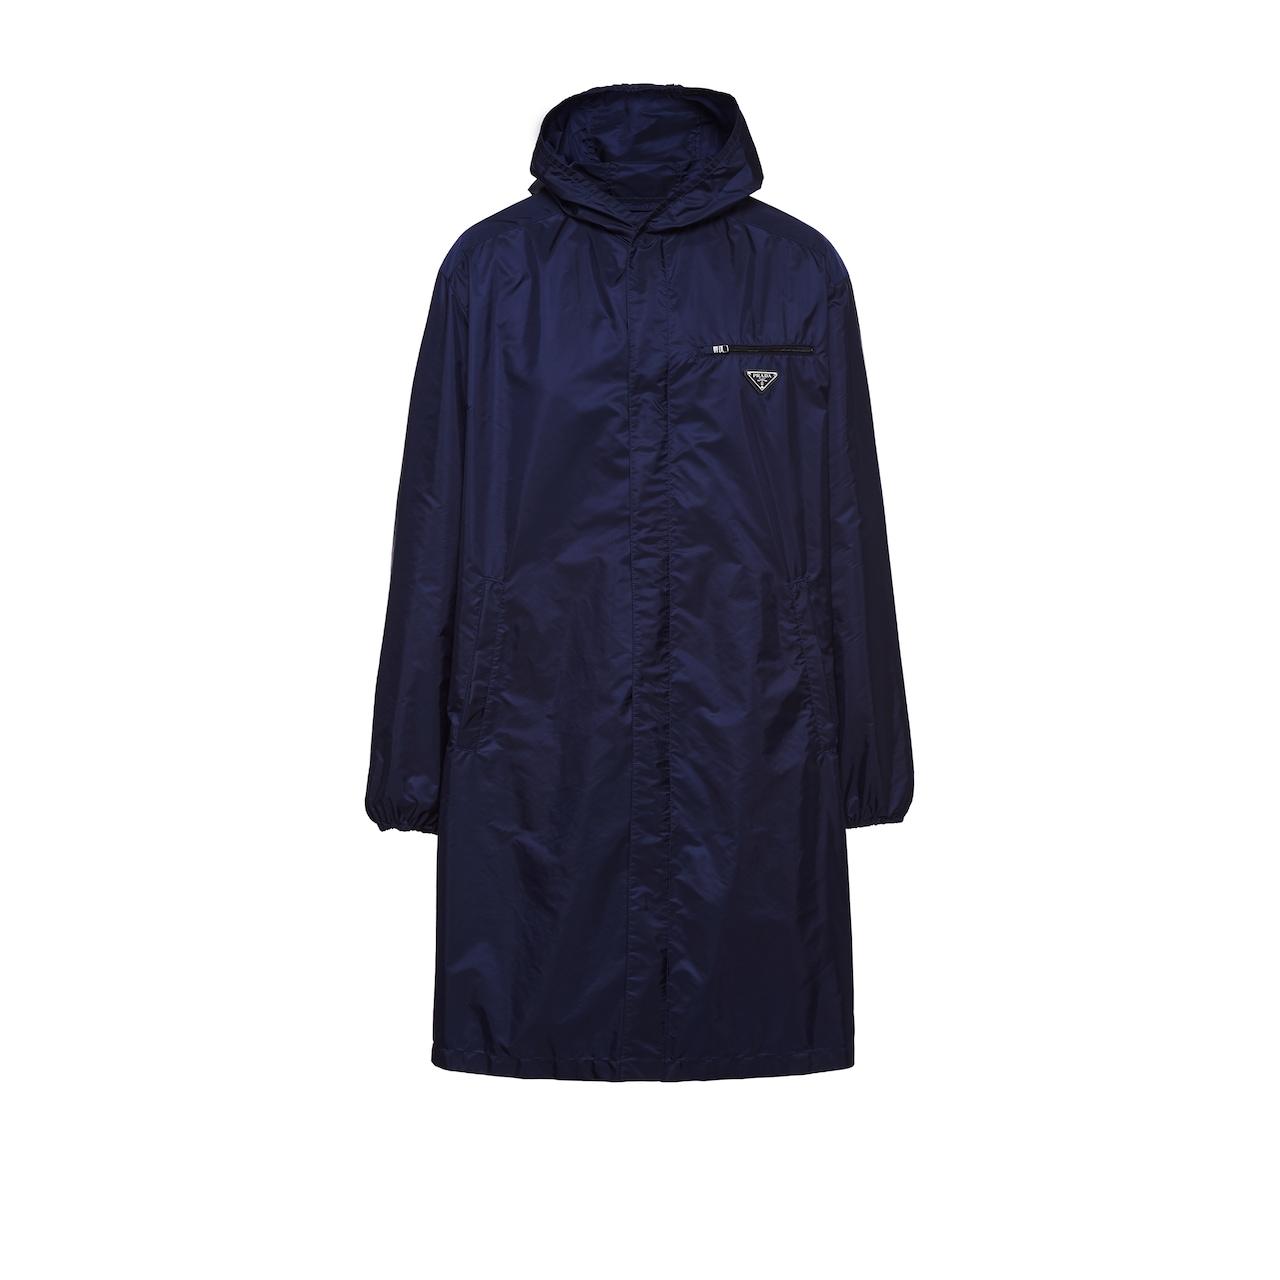 Prada Reversible nylon raincoat 1